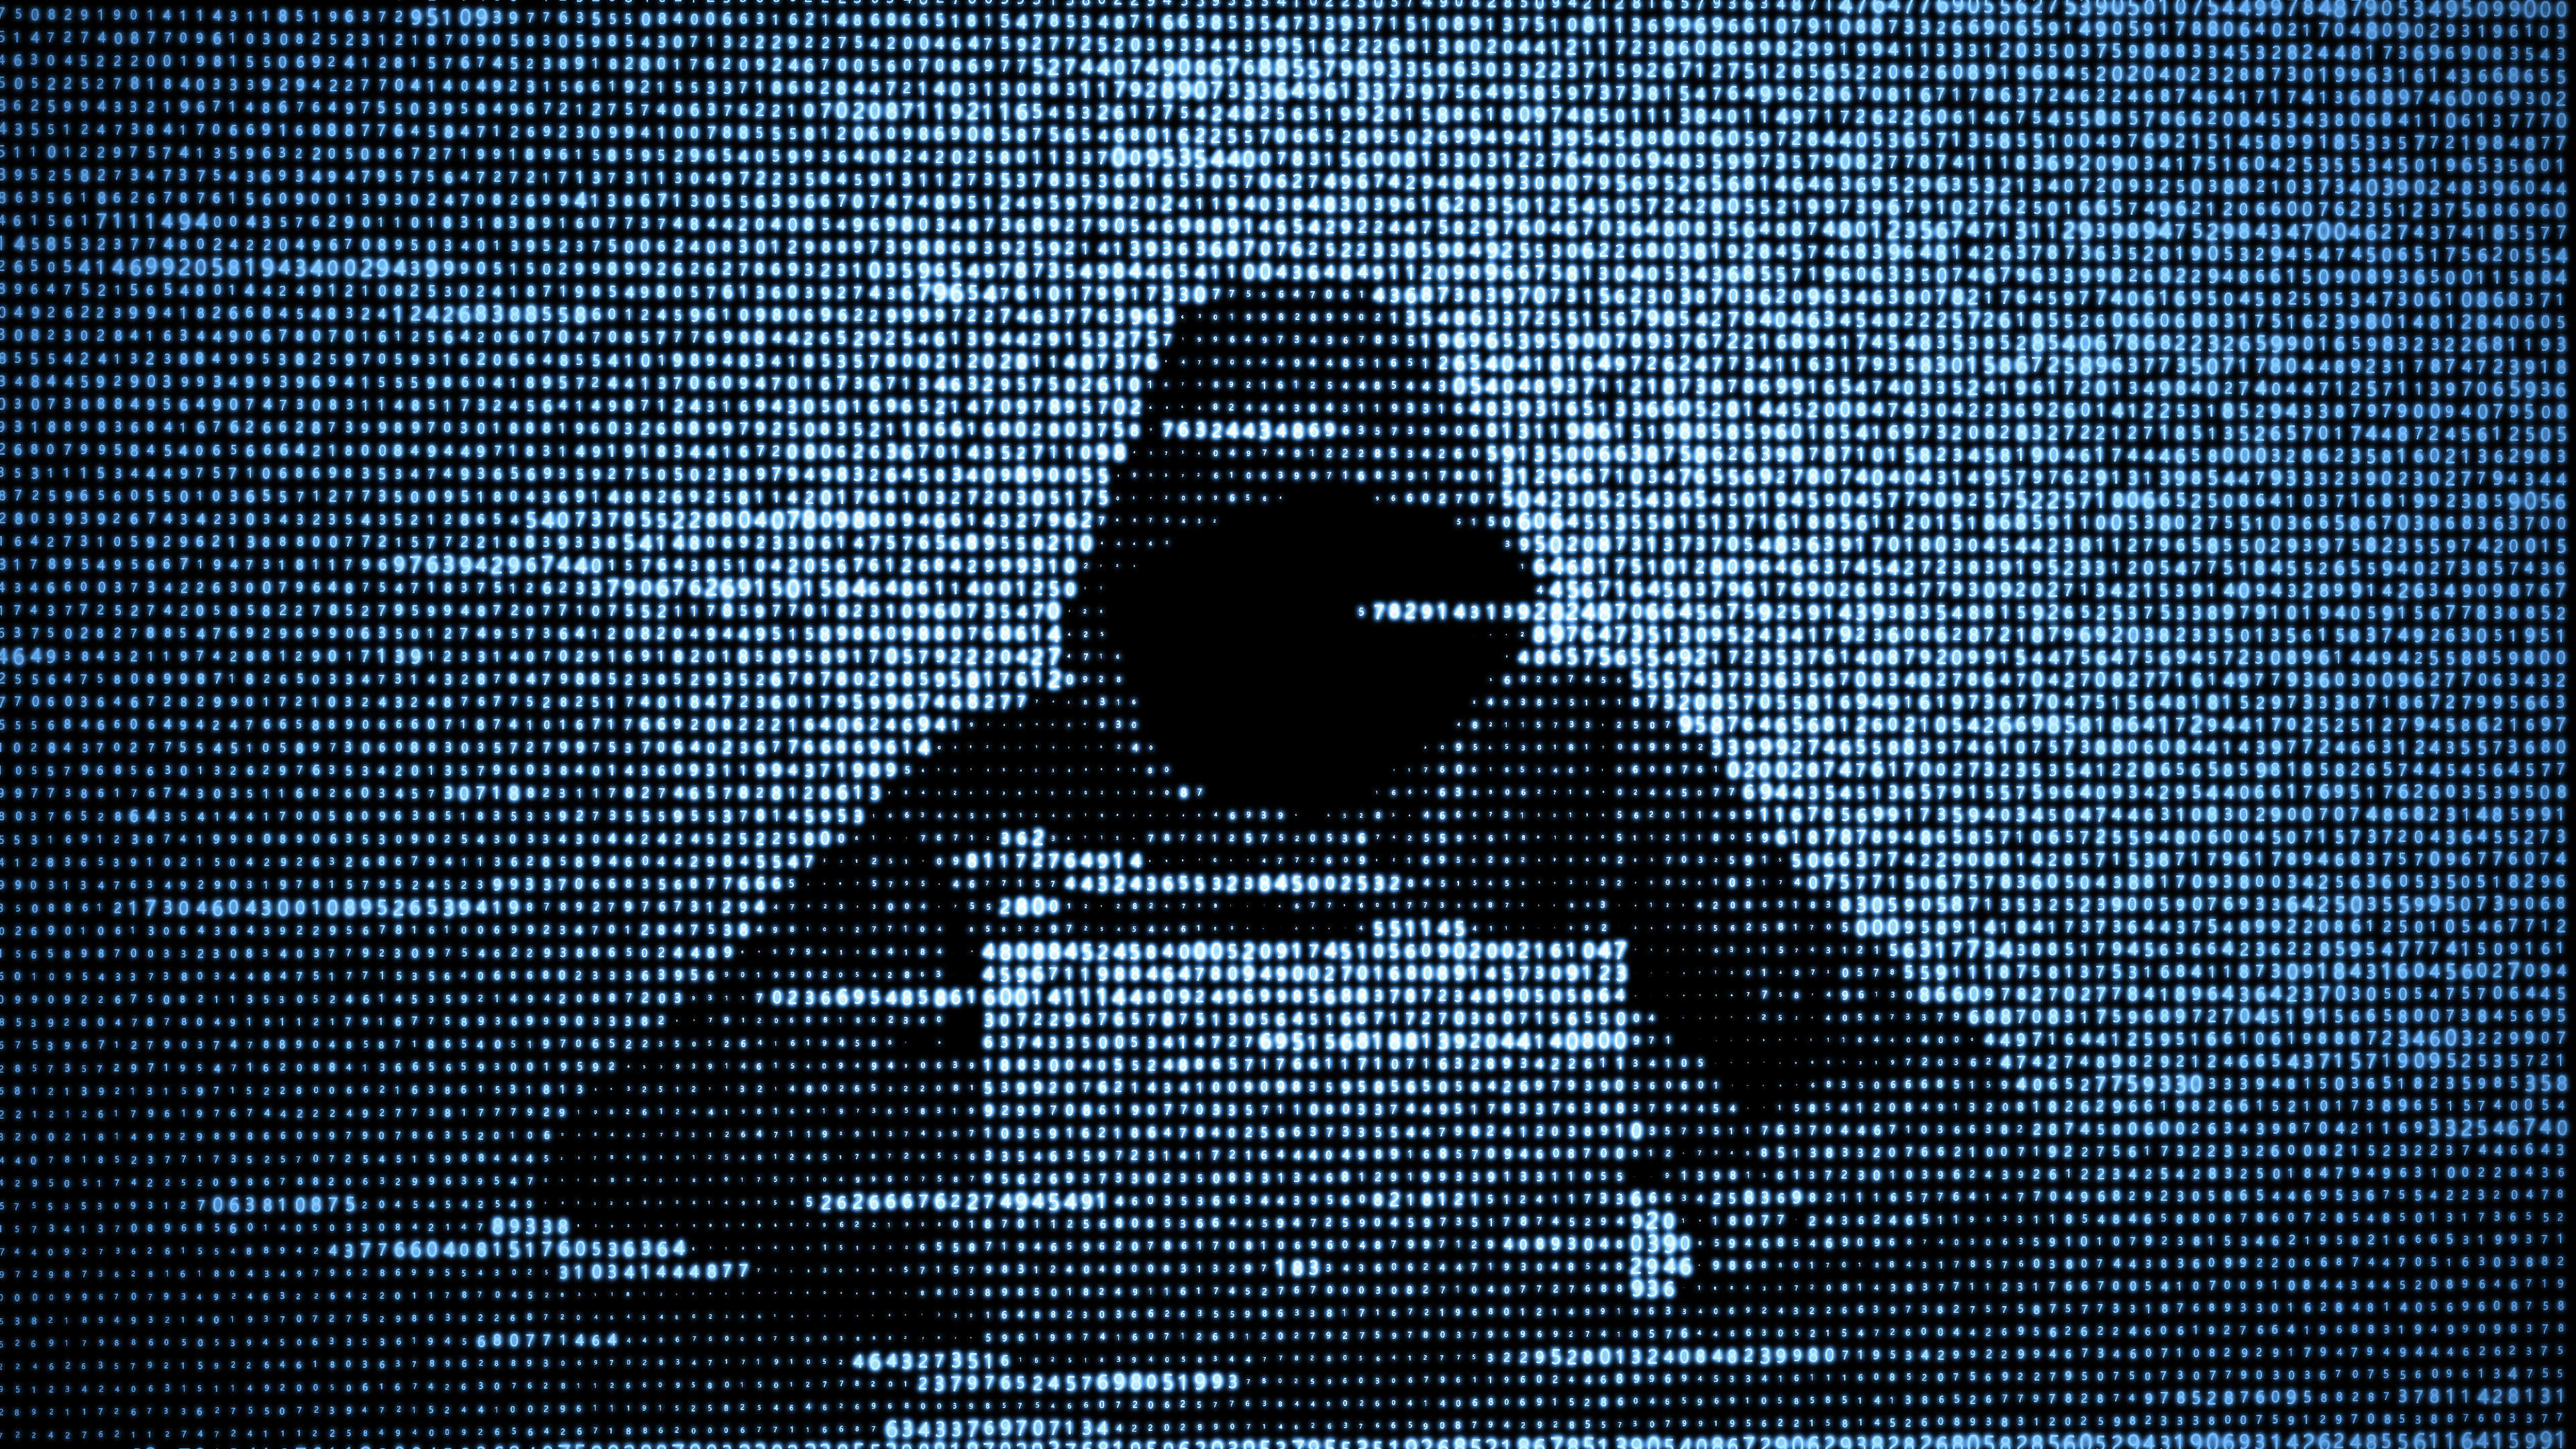 BGP hijacking examples